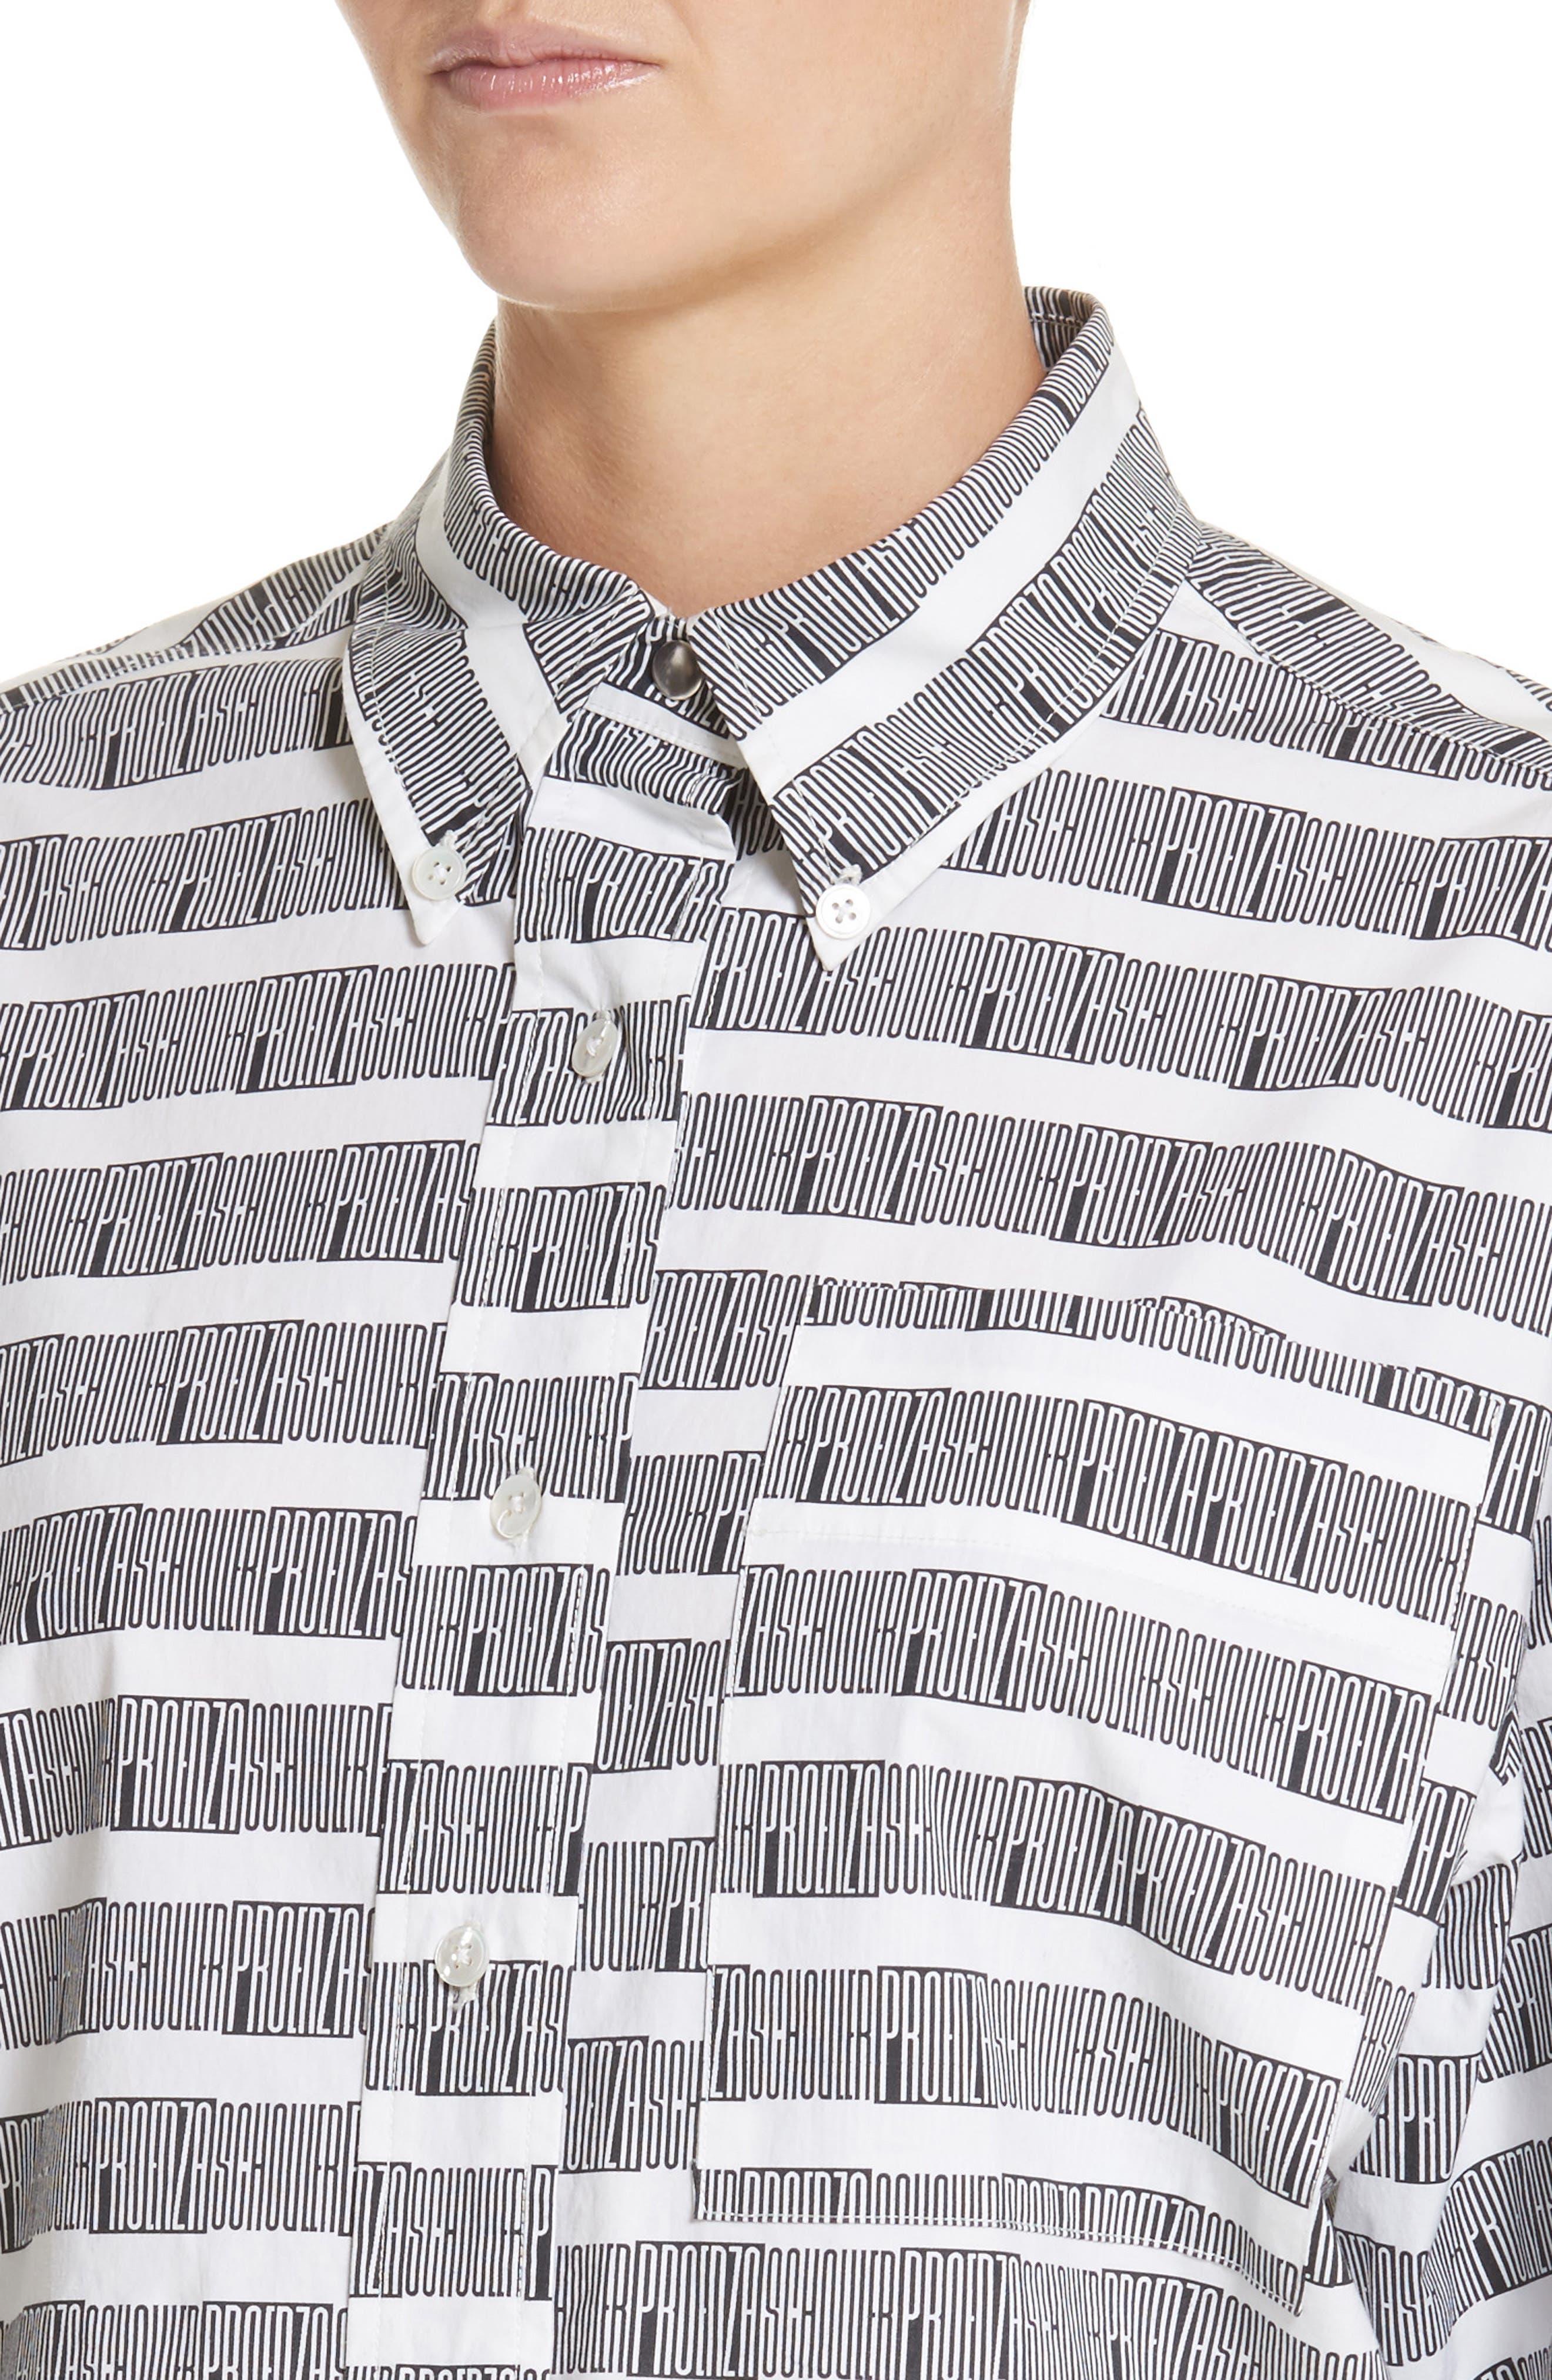 PSWL Graphic Stripe Cotton Top,                             Alternate thumbnail 4, color,